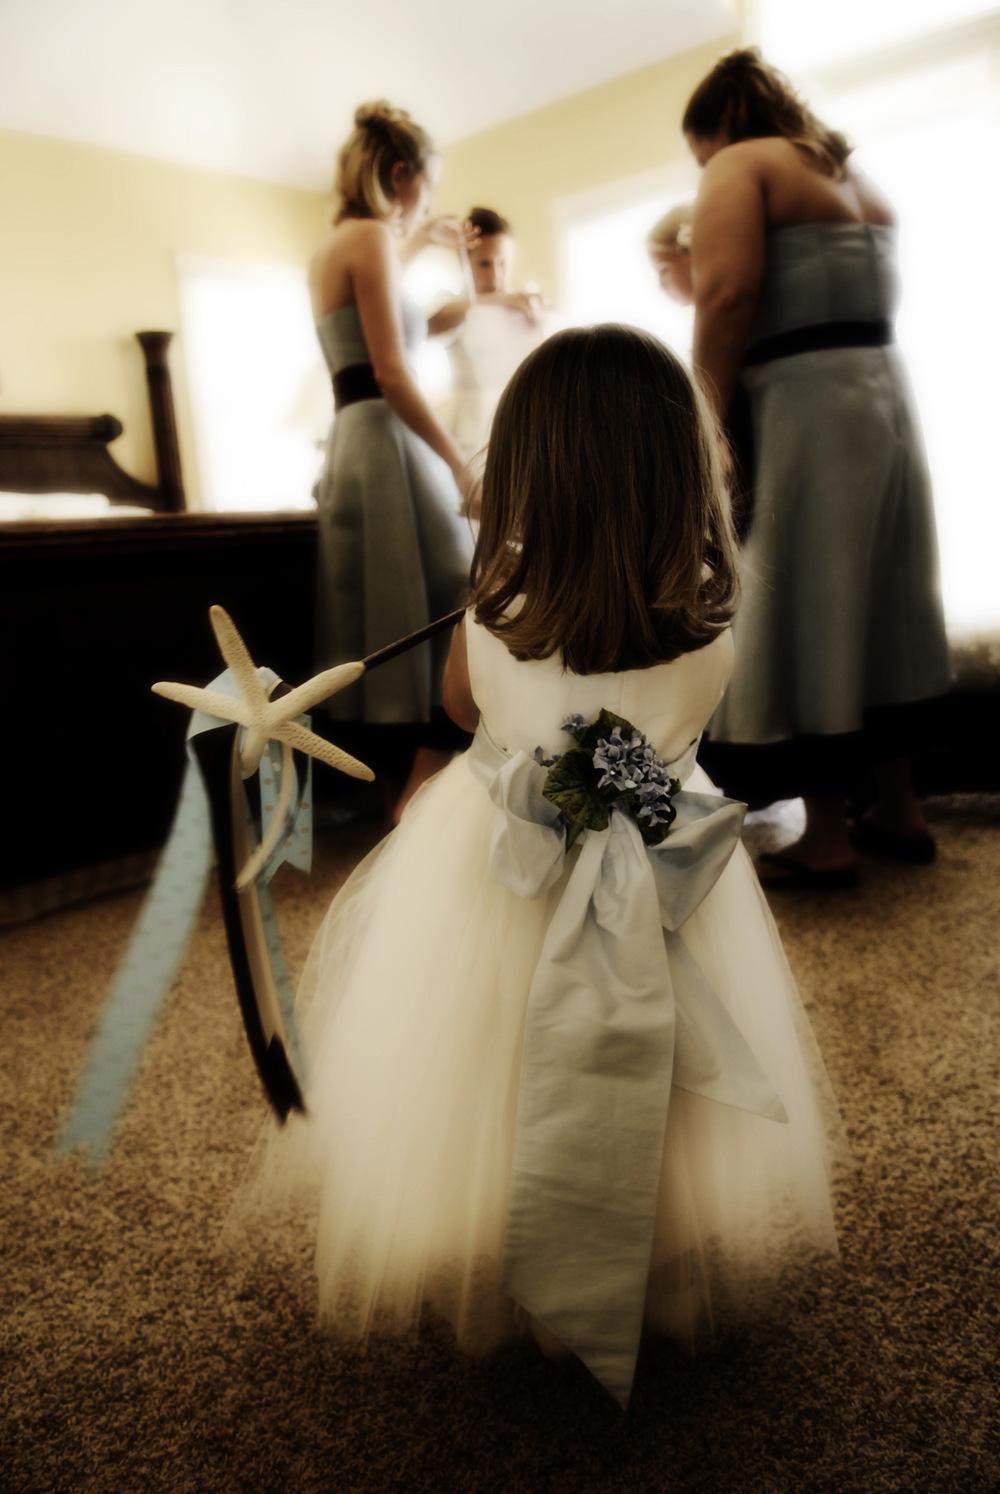 bickford_weddings_girls.0002.JPG